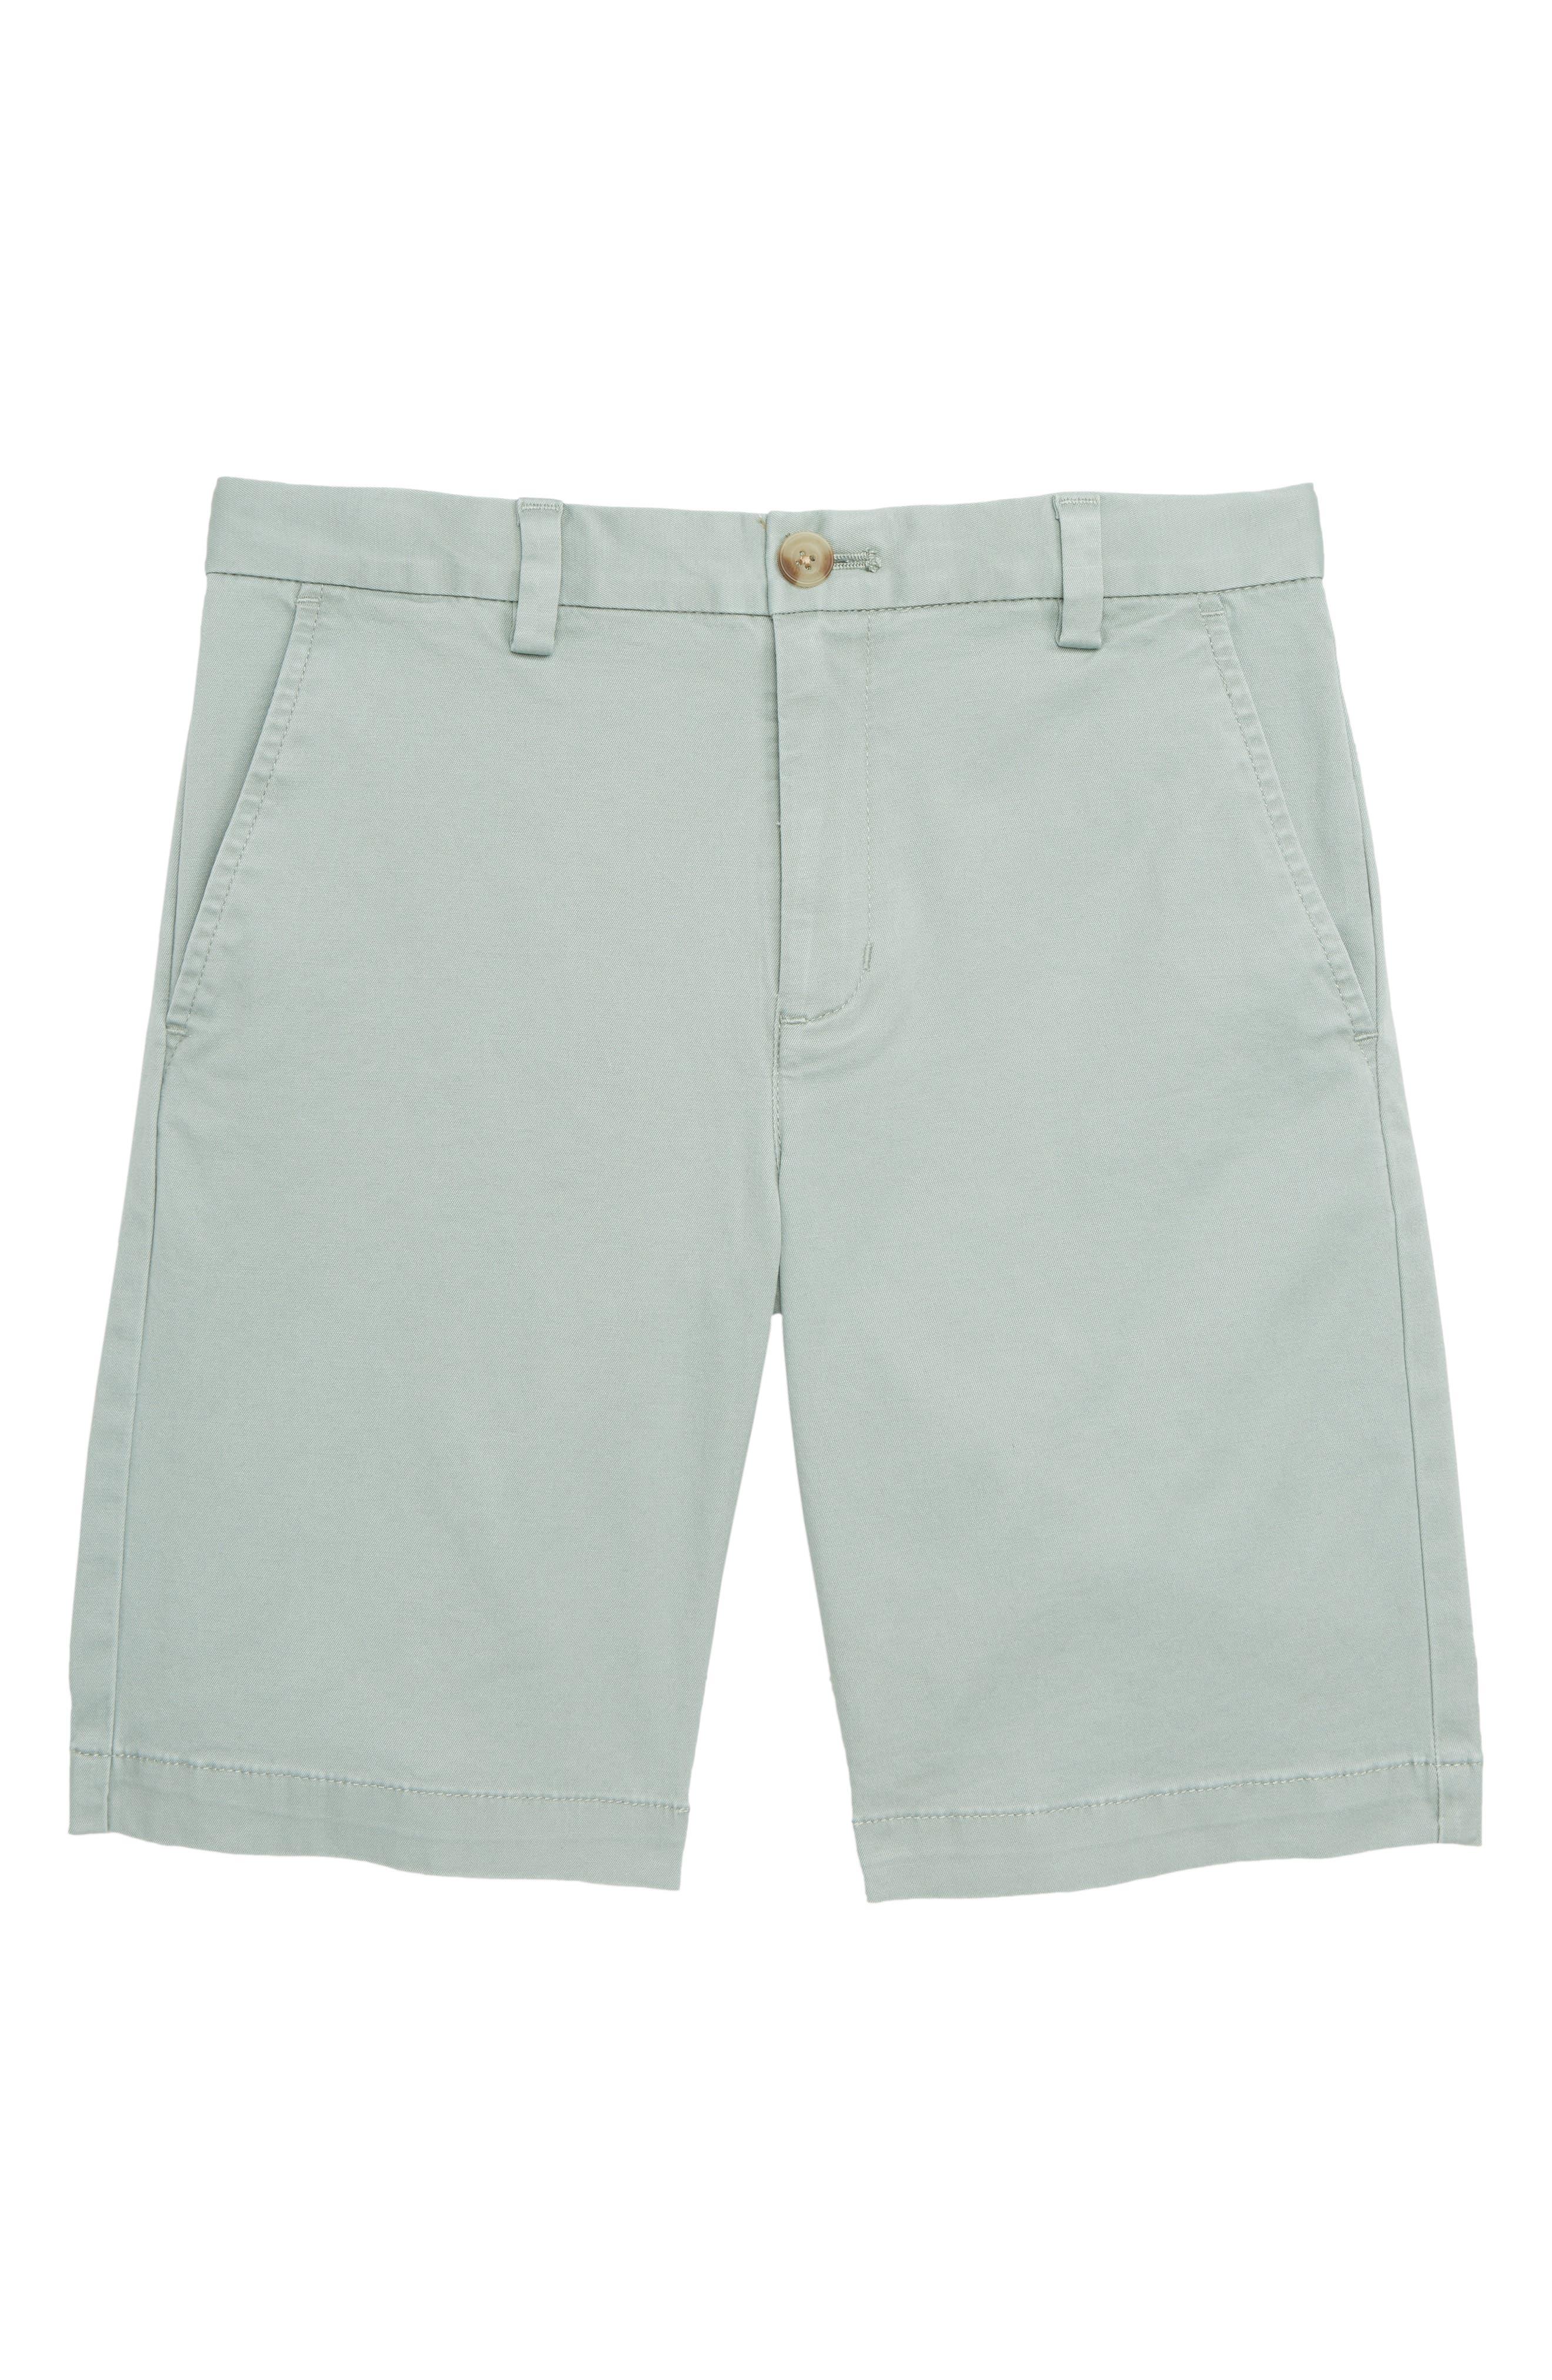 Stretch Breaker Shorts,                             Main thumbnail 1, color,                             020